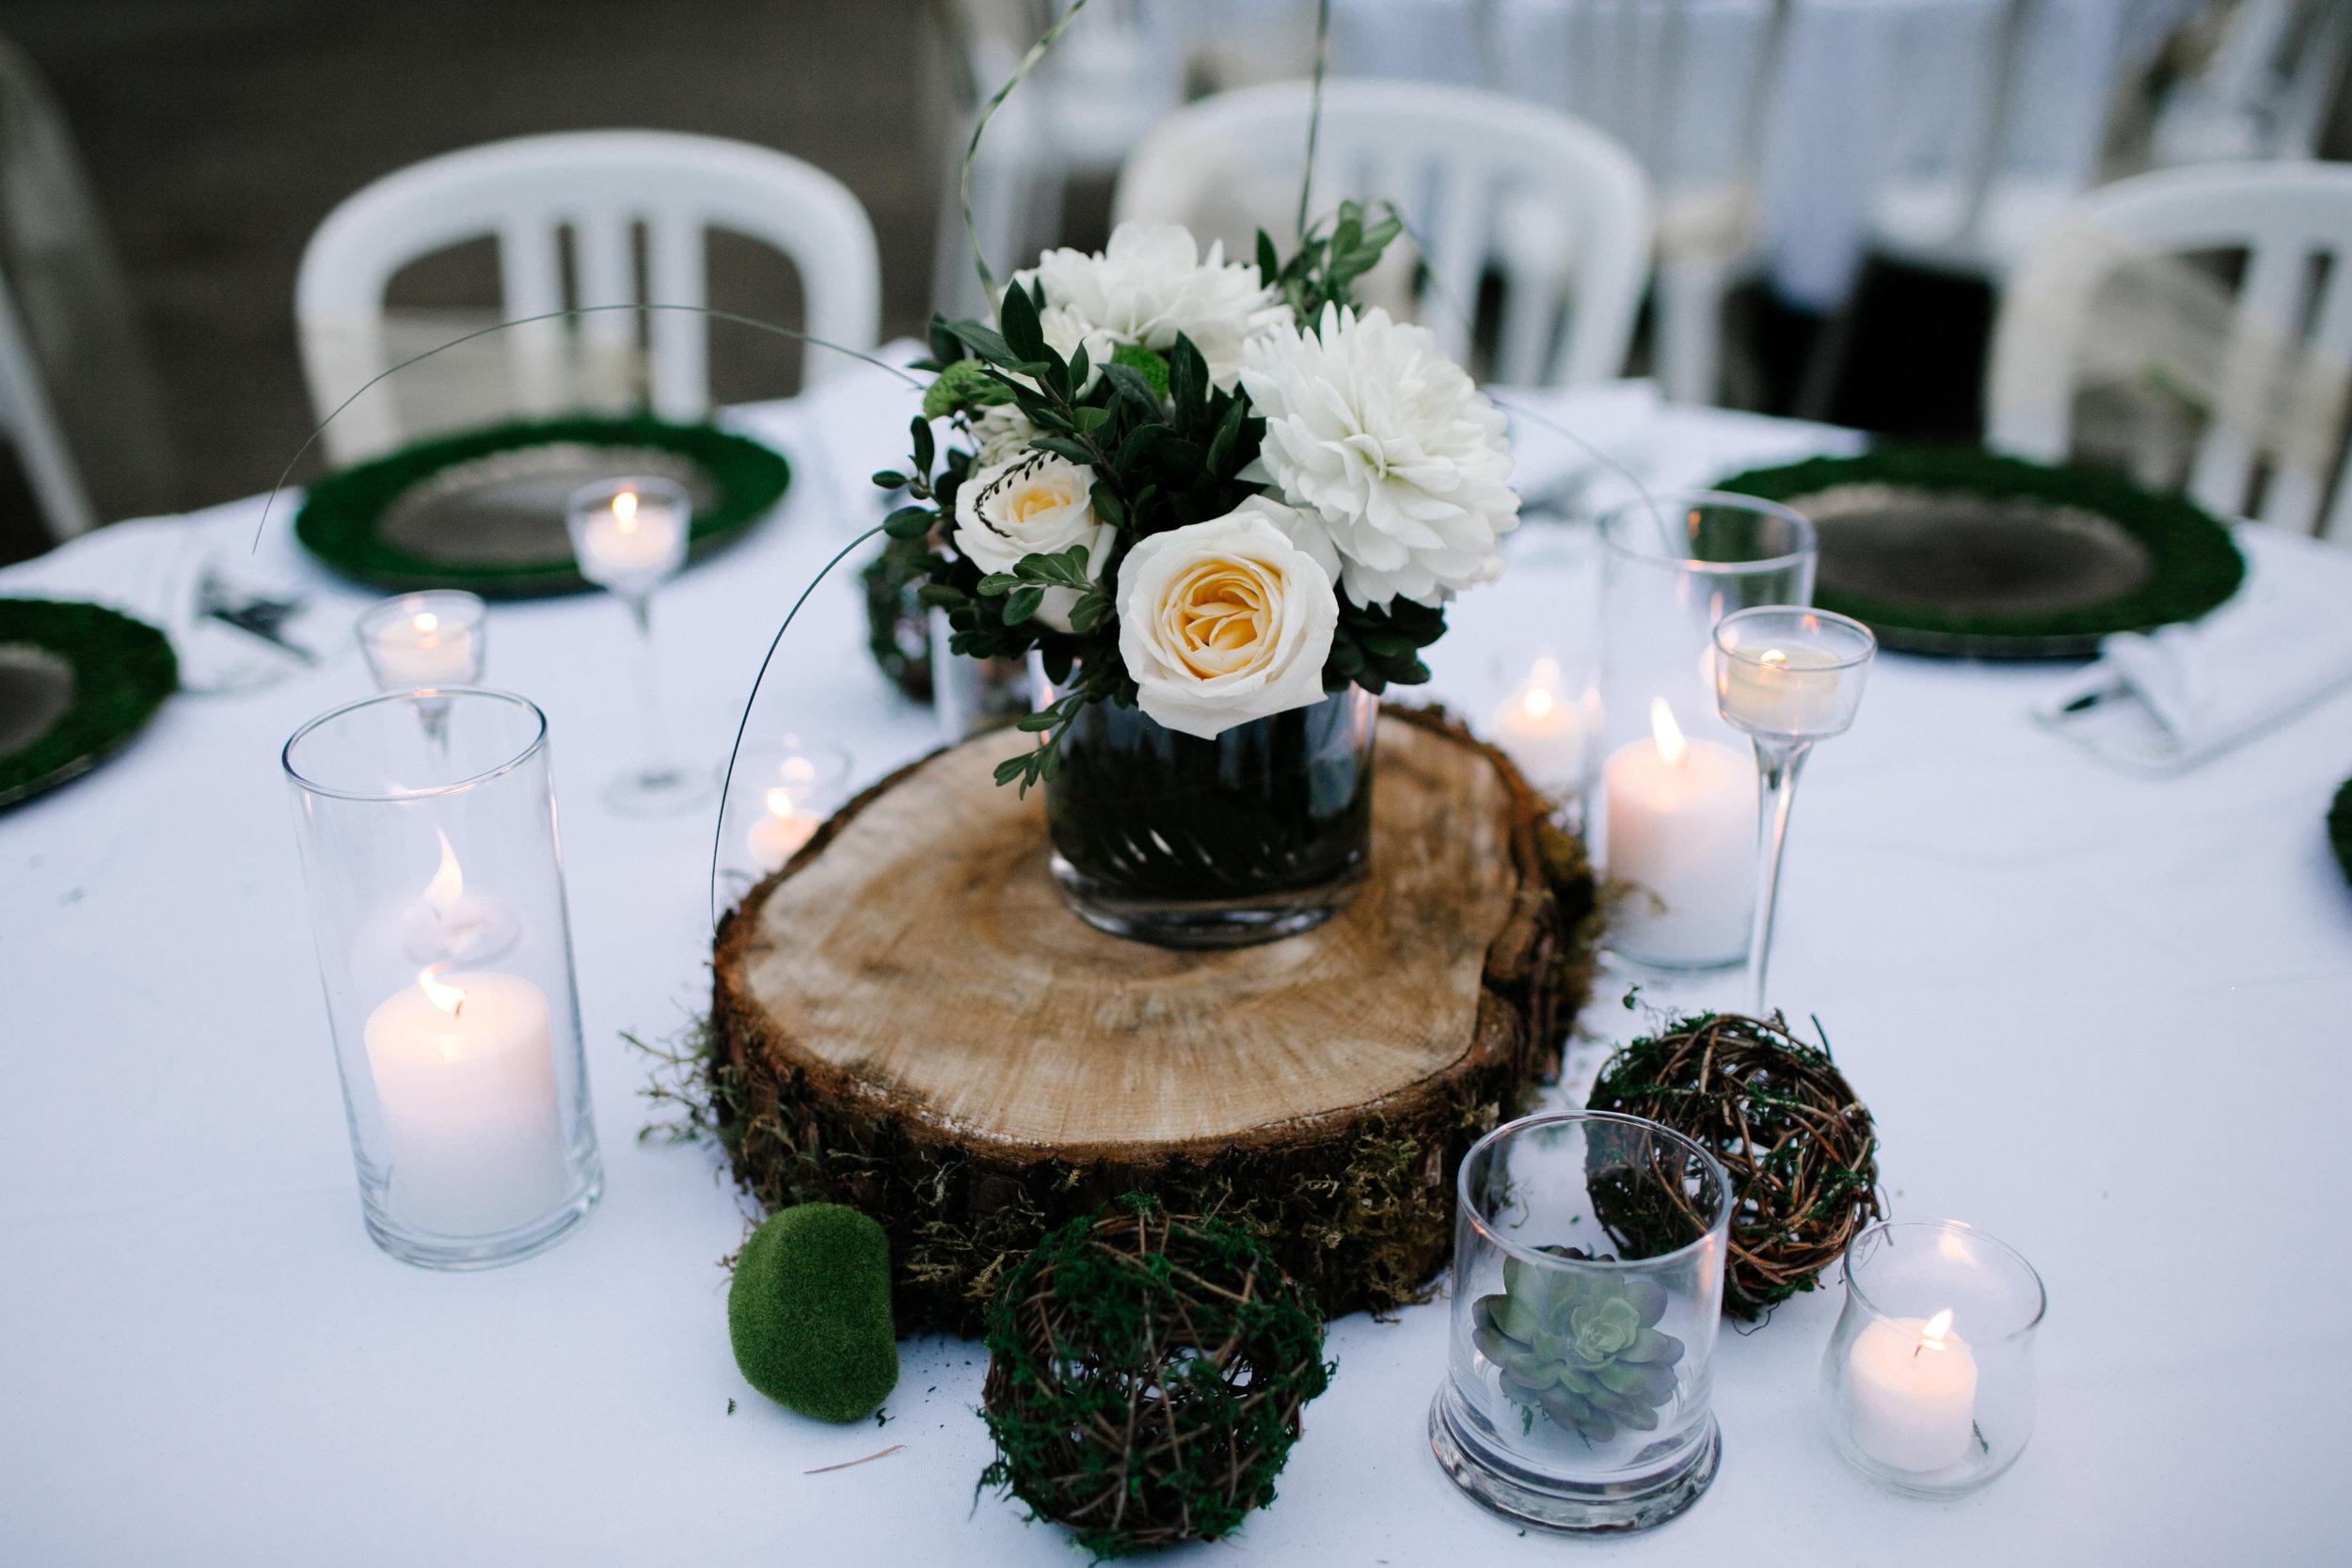 Sevlynn-Photography-Teresa-Chandler-Wedding-62.jpg